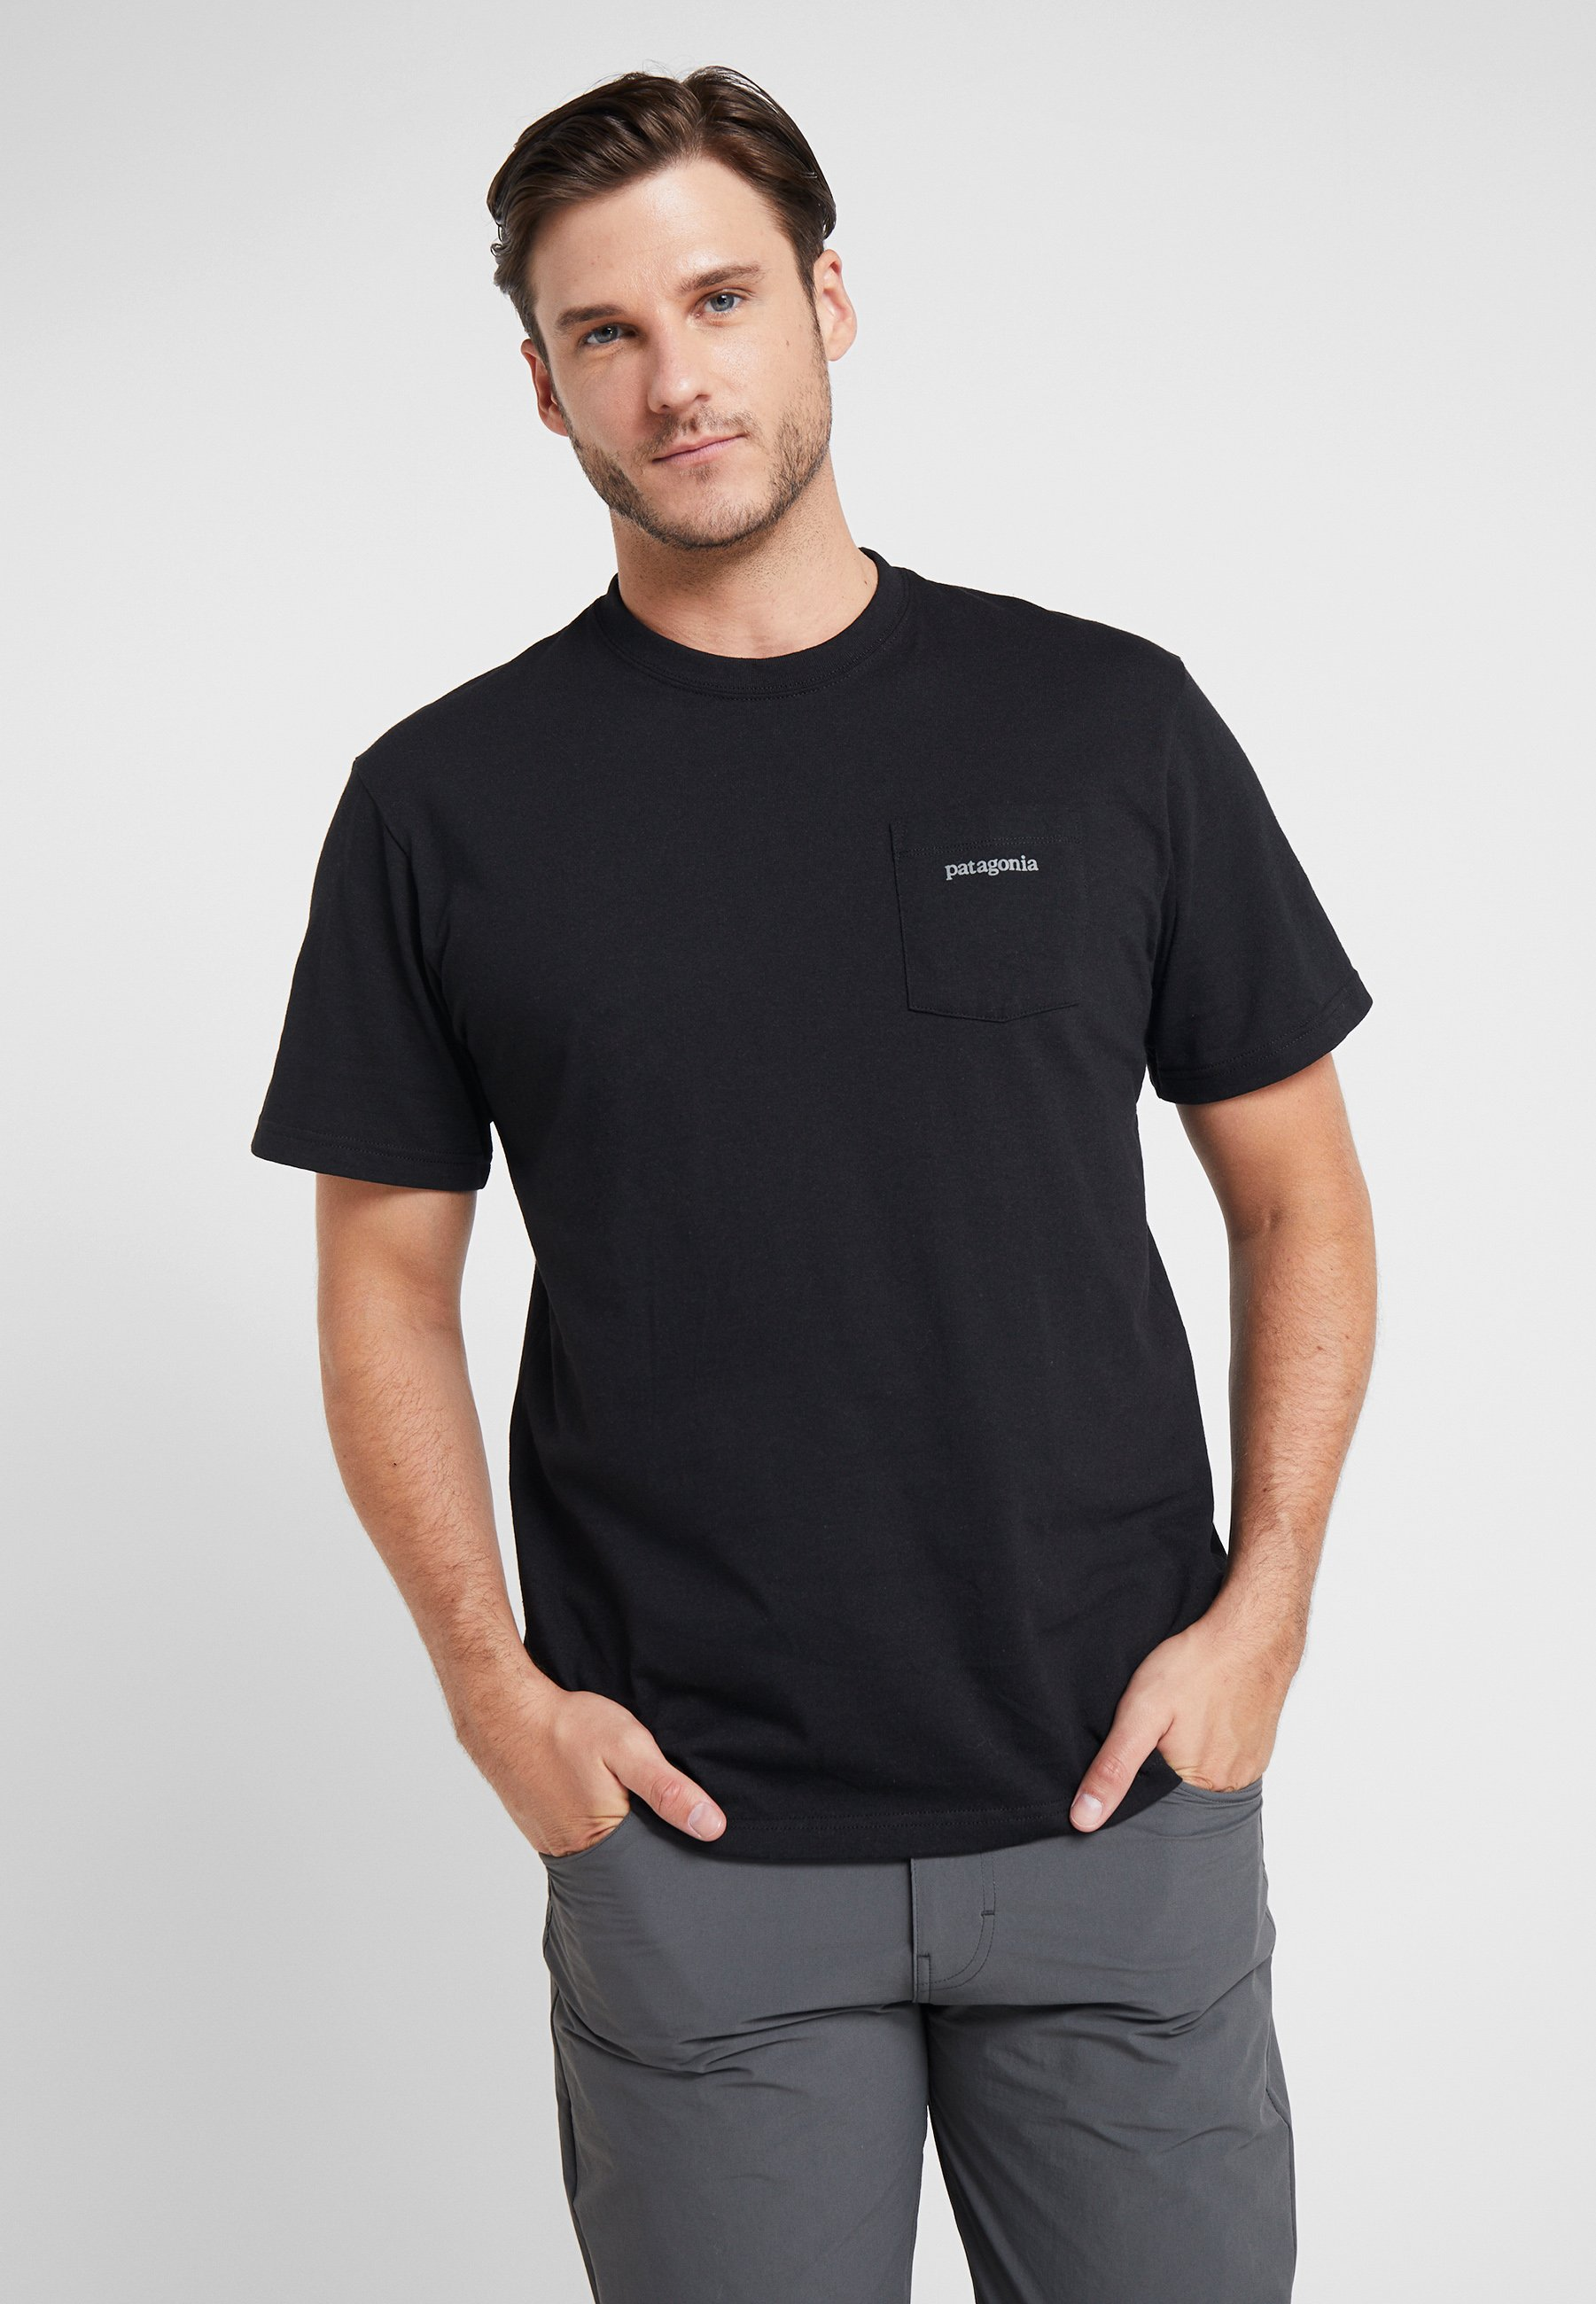 Imprimé TeeT Line Patagonia Ridge Pocket Responsibili shirt Logo Black MpSUVzGq